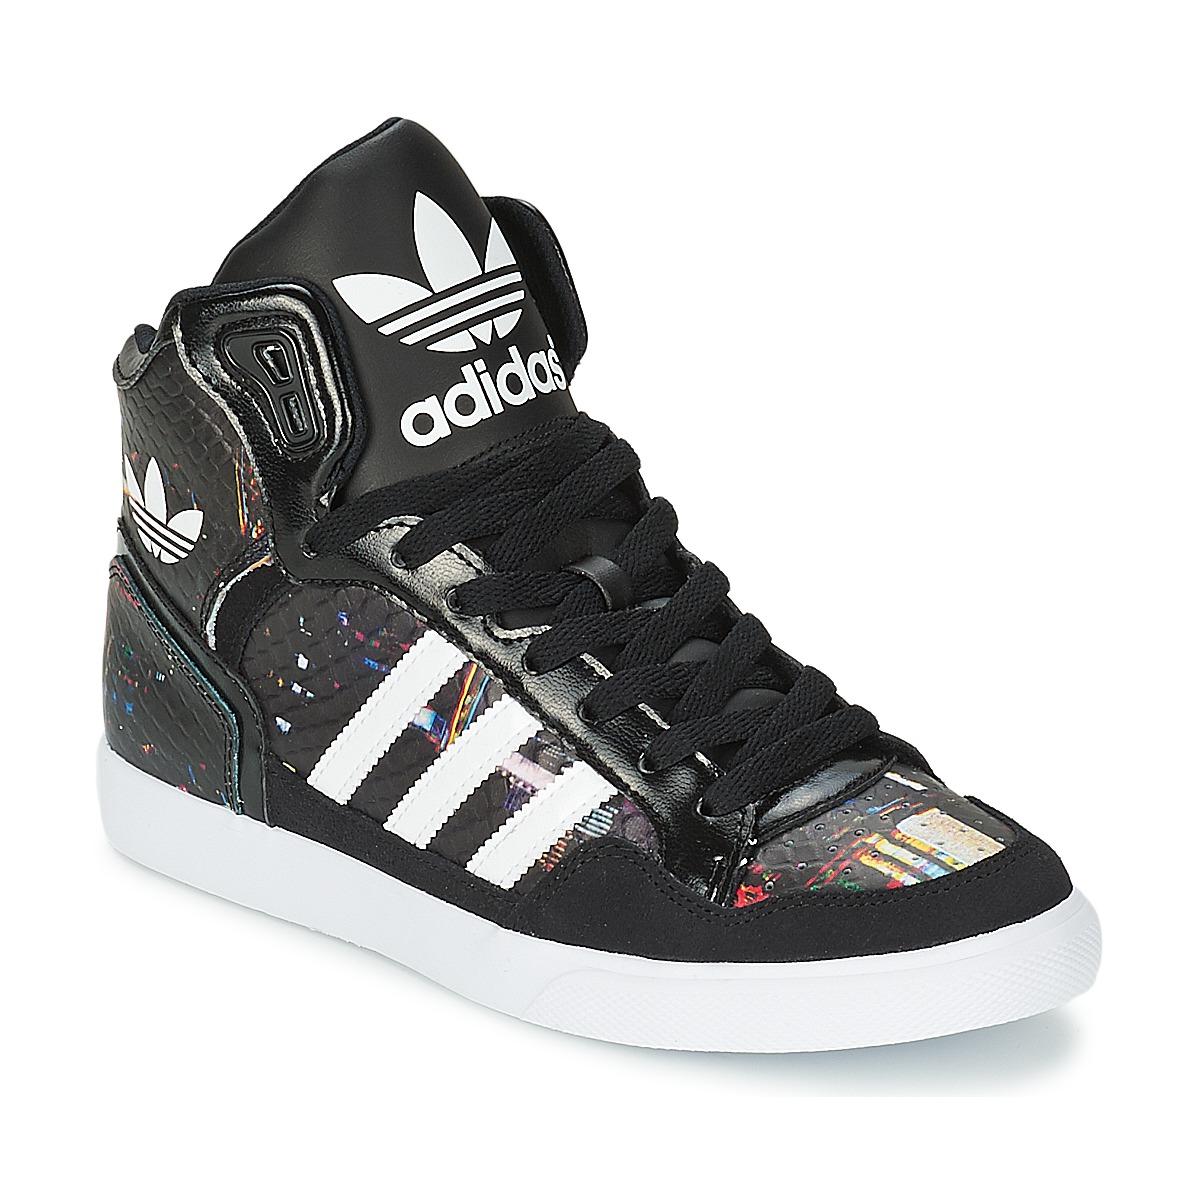 Femme Cher 8nko0xwp Acheter Adidas Pas Basket Haute hCdtrsQx